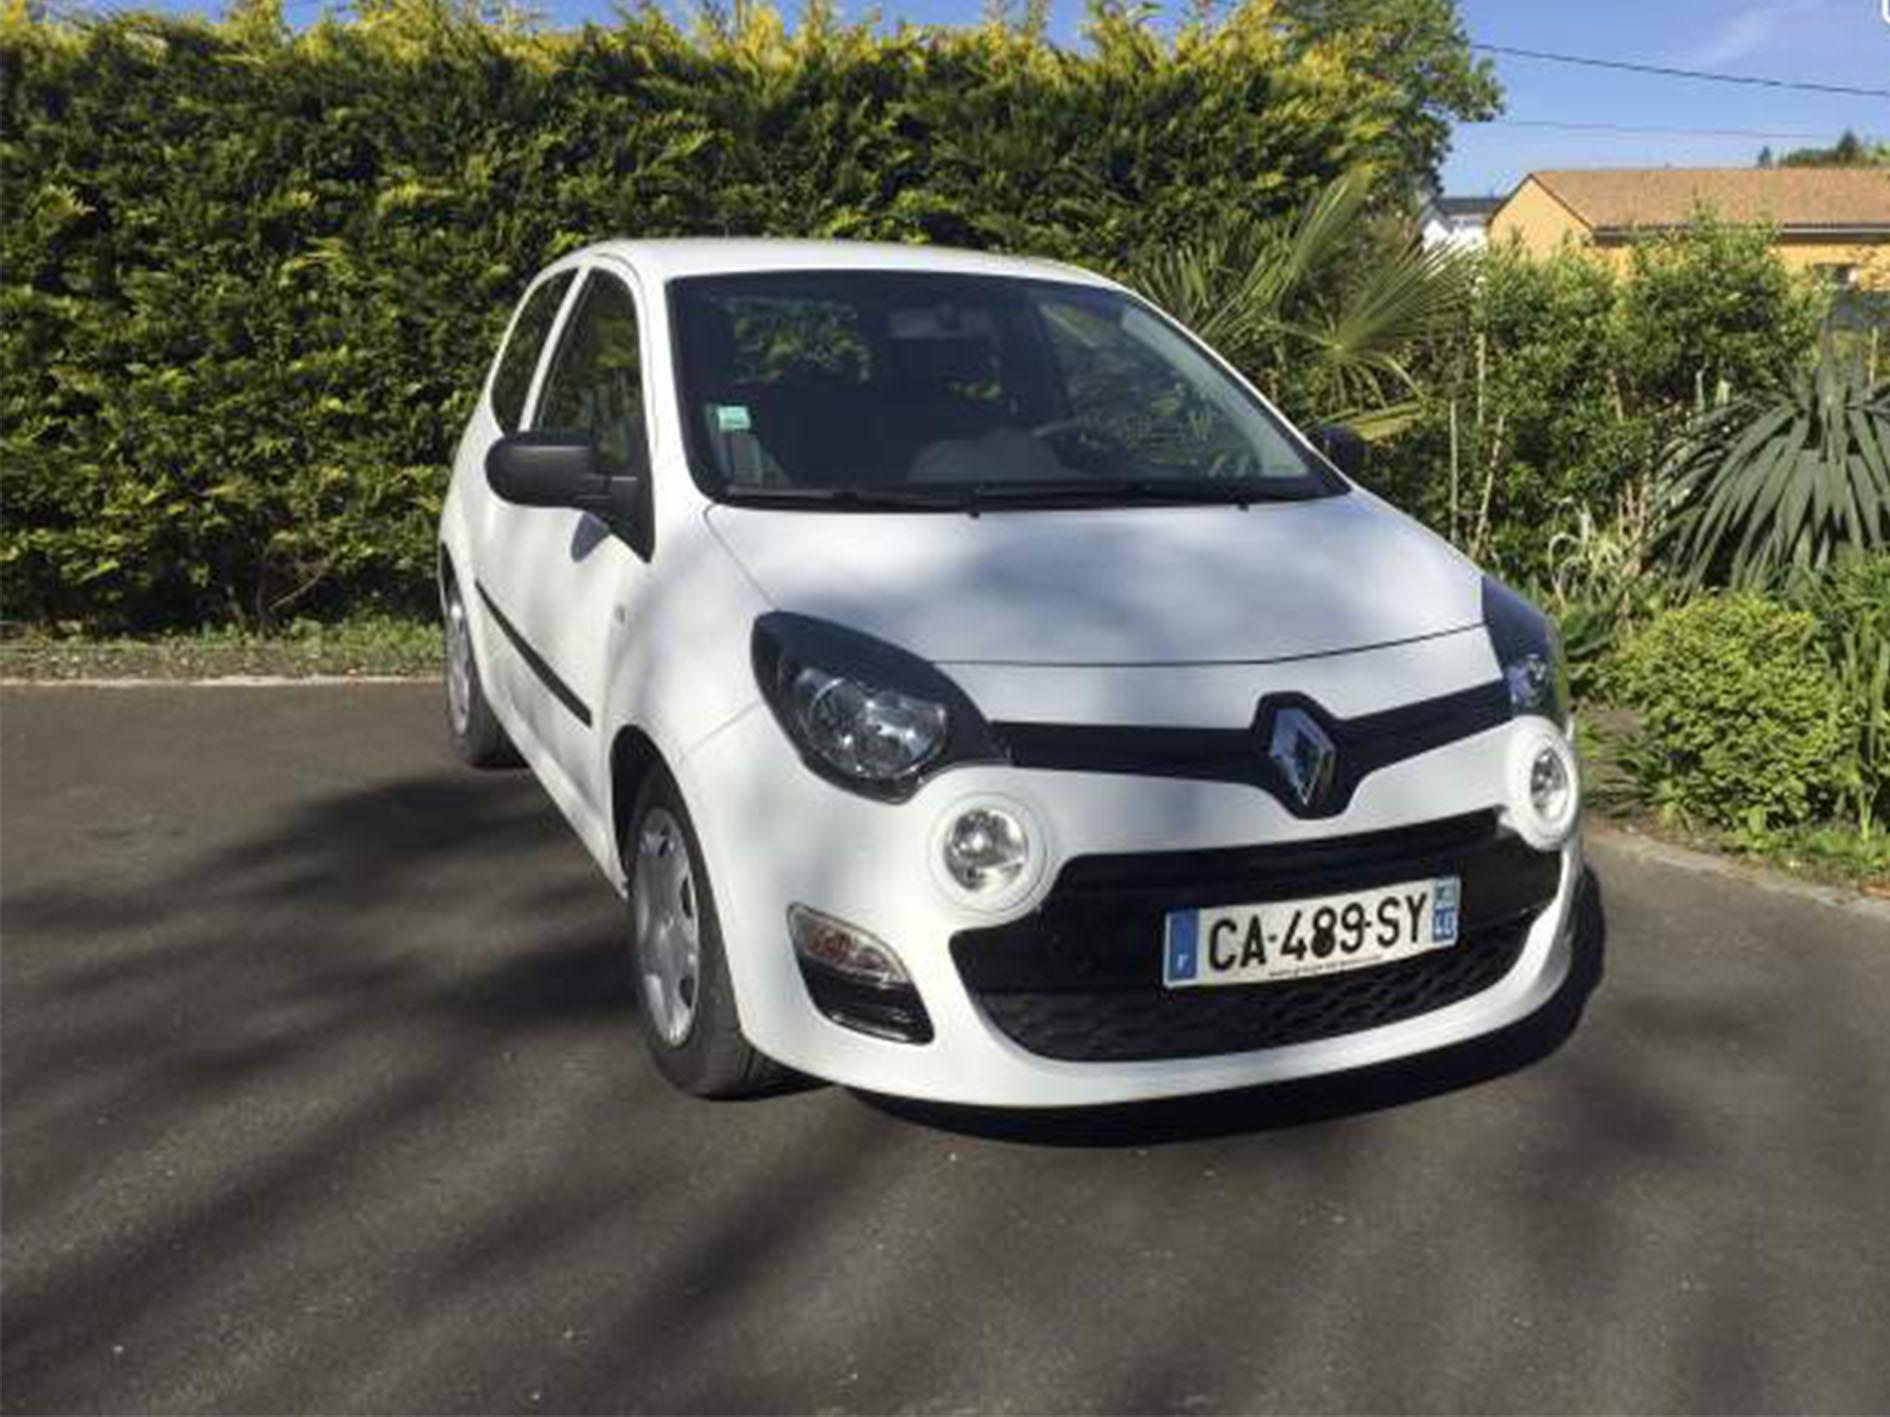 Vente de voiture occasion Renault twingo